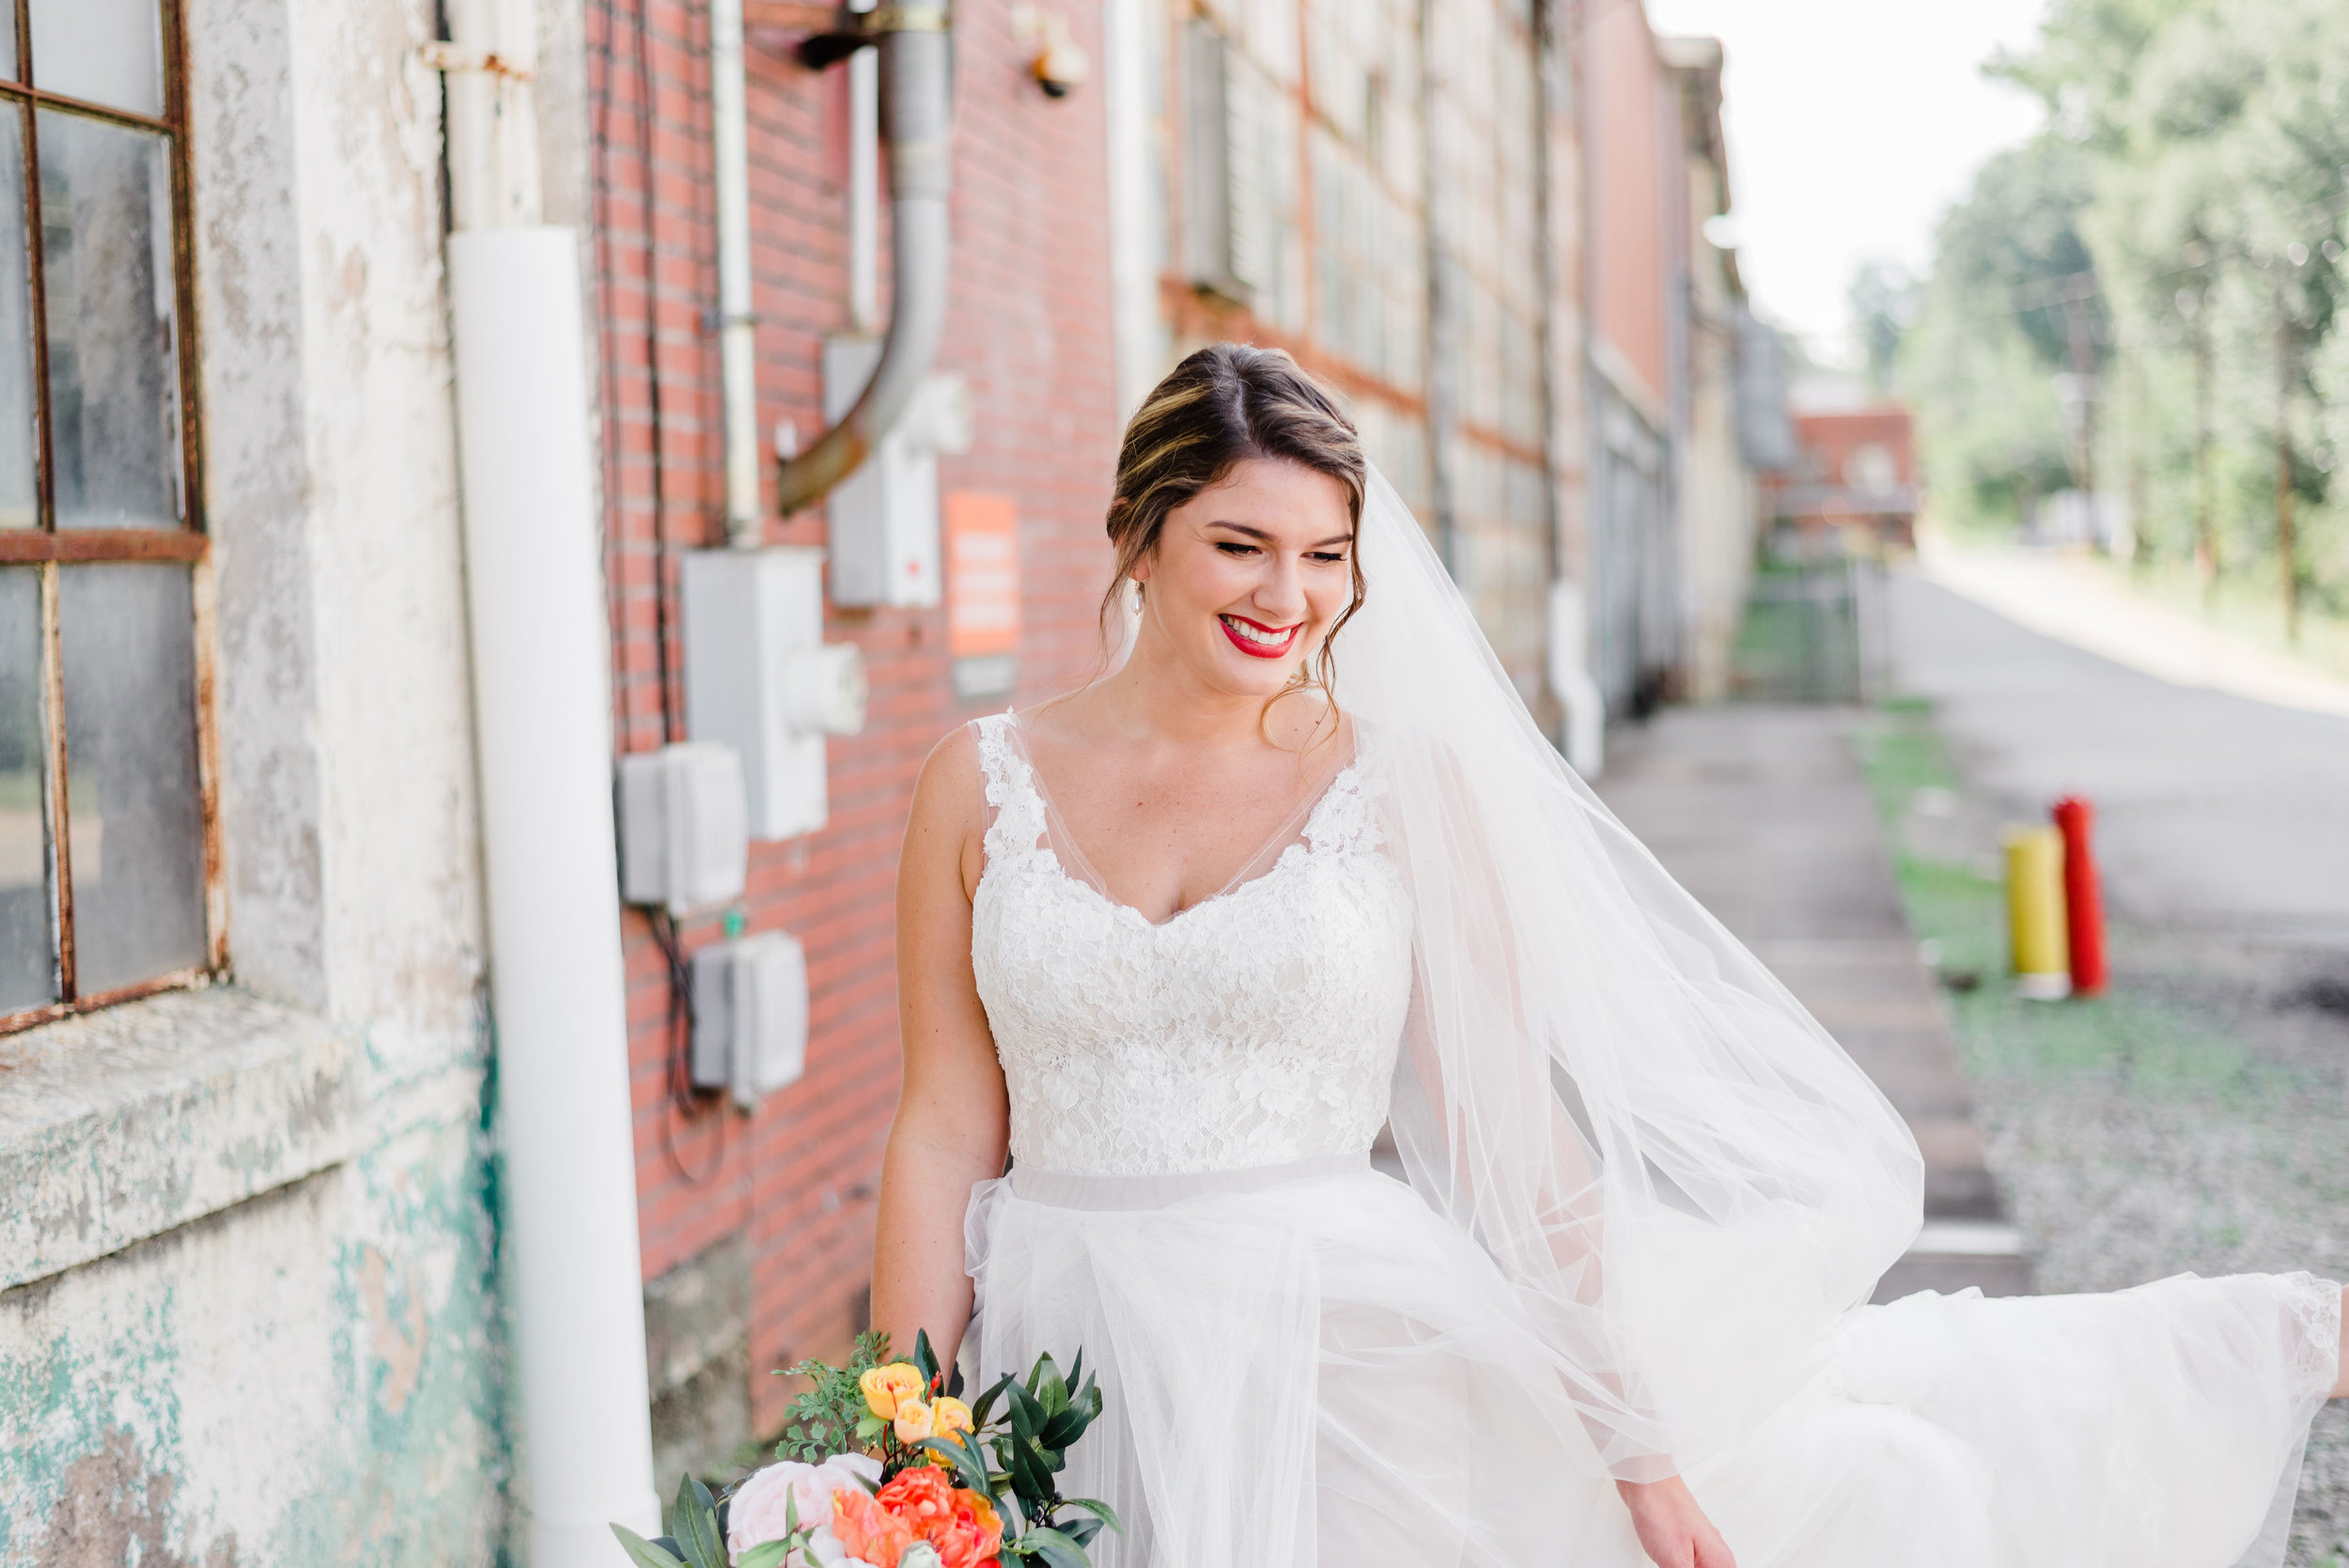 TaylorAdams_bridals-131.jpg